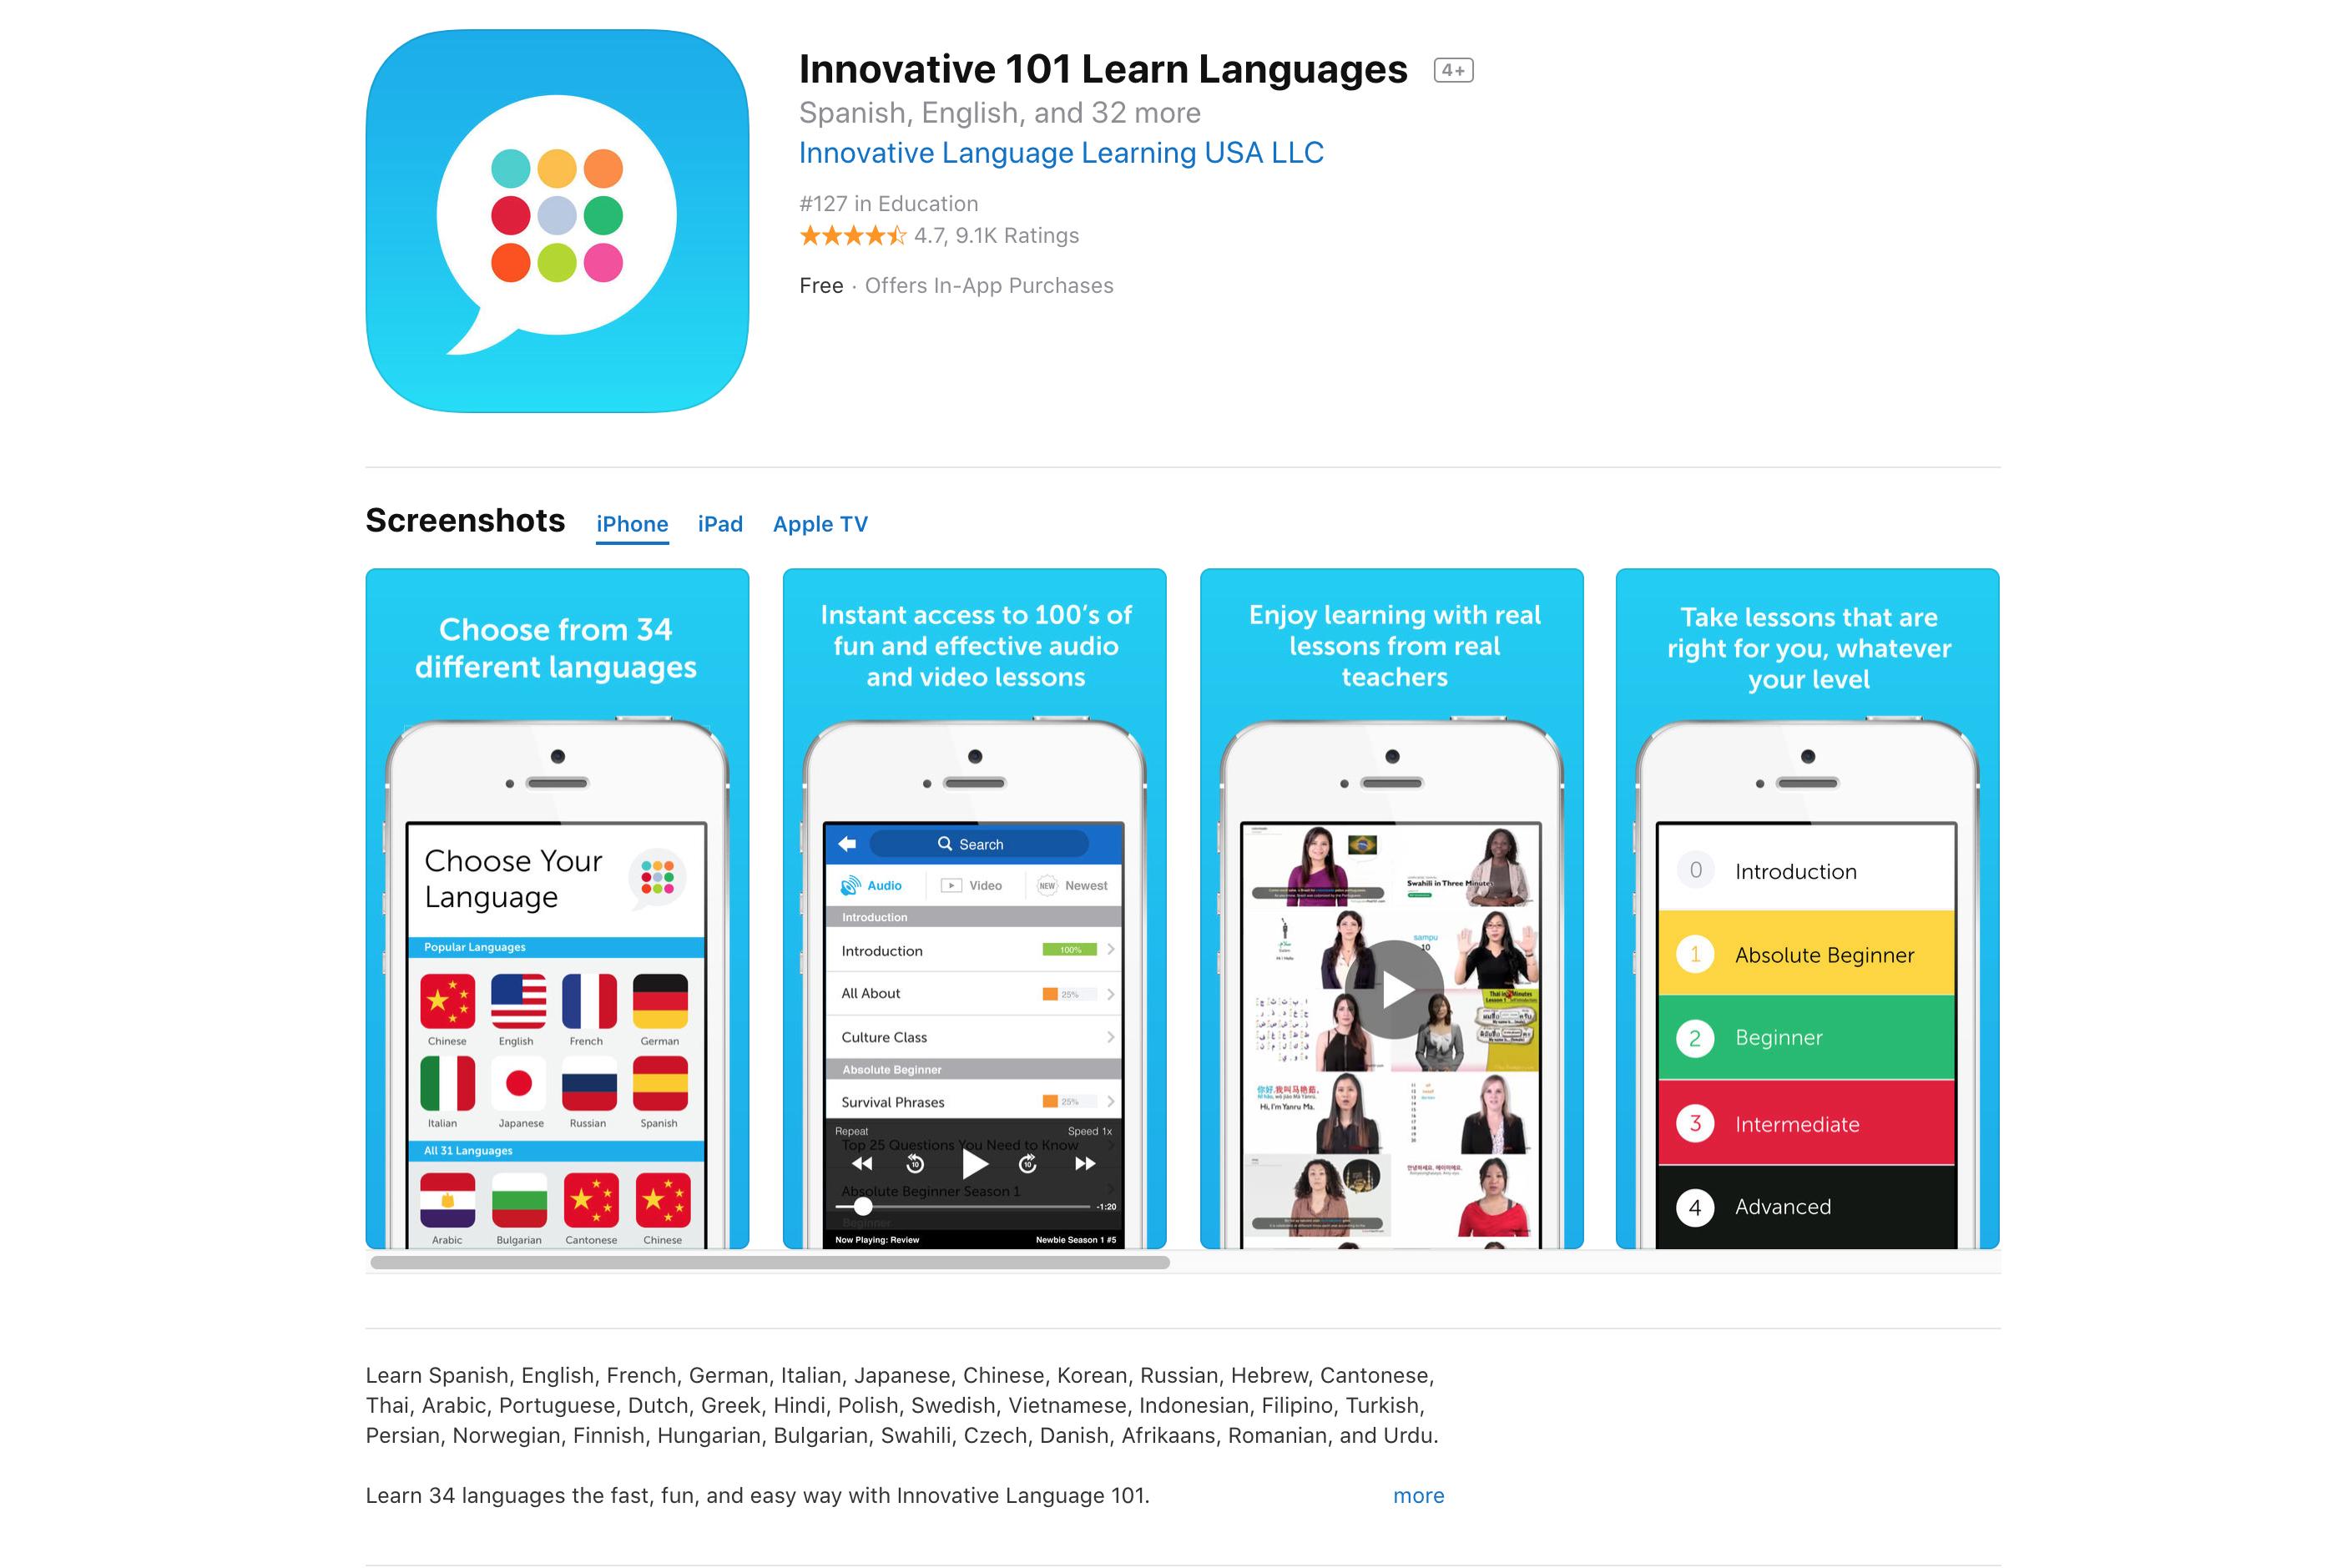 Innovative 101